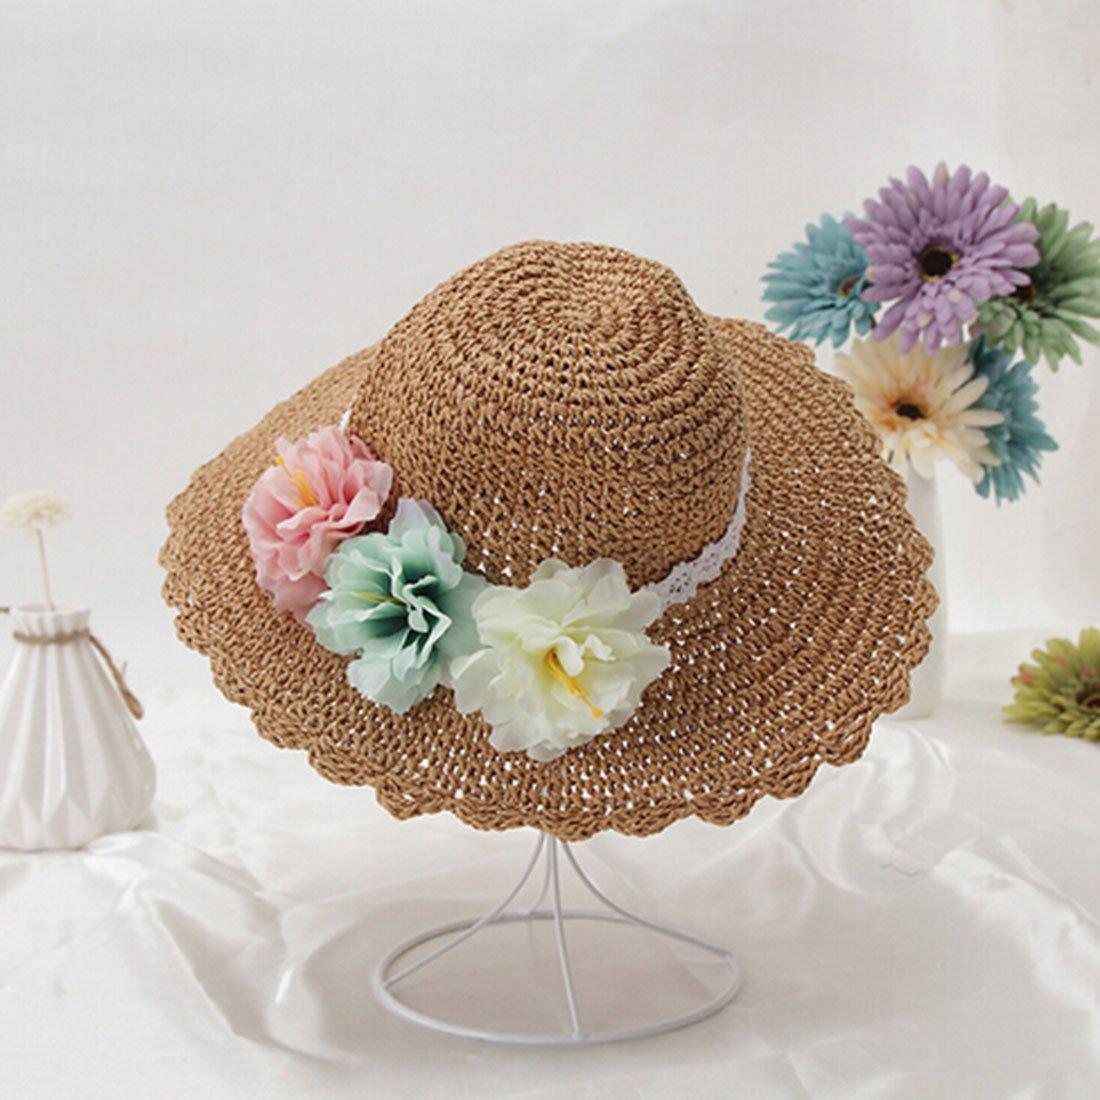 Little Chair Kids Girl Wide Brim Paper Straw Floral Sun Hat Beach Cap